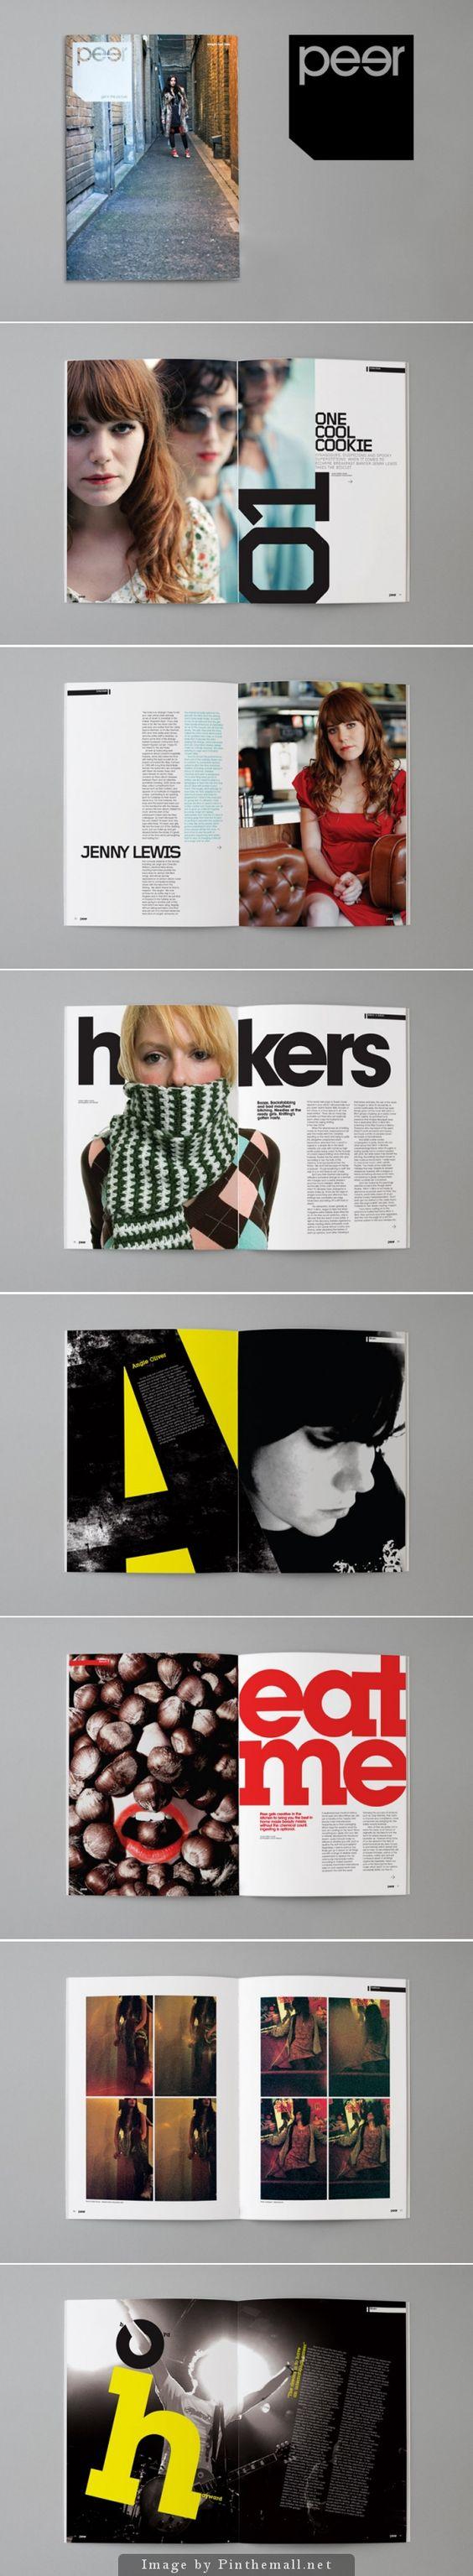 Emily Kuchar Wikipedia Great 798 best magazine design images on pinterest   editorial design